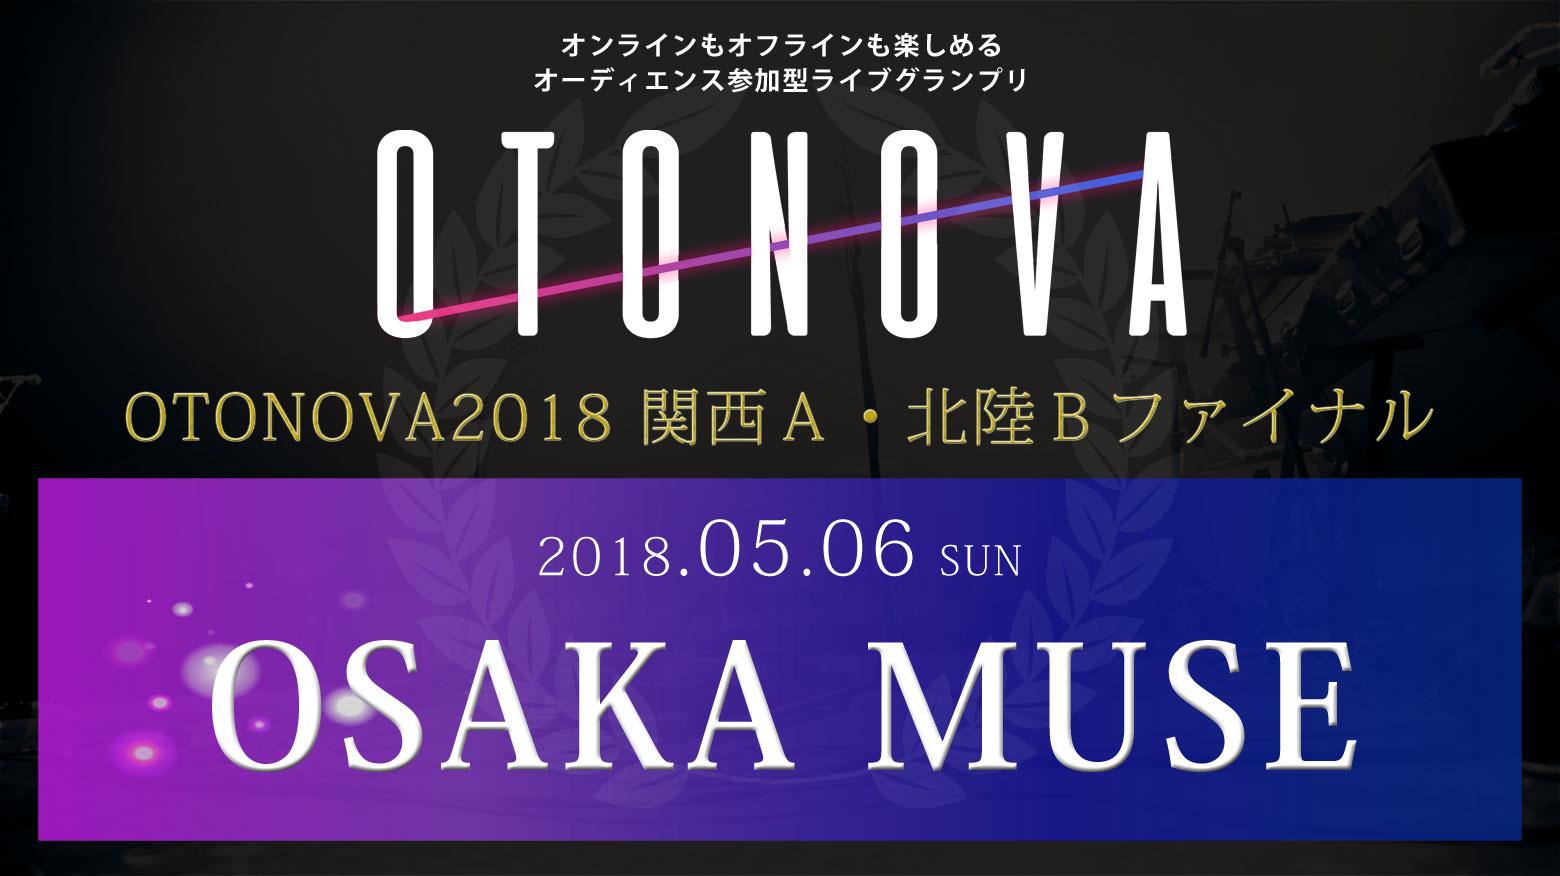 OTONOVA2018「関西A・北陸Bファイナル」